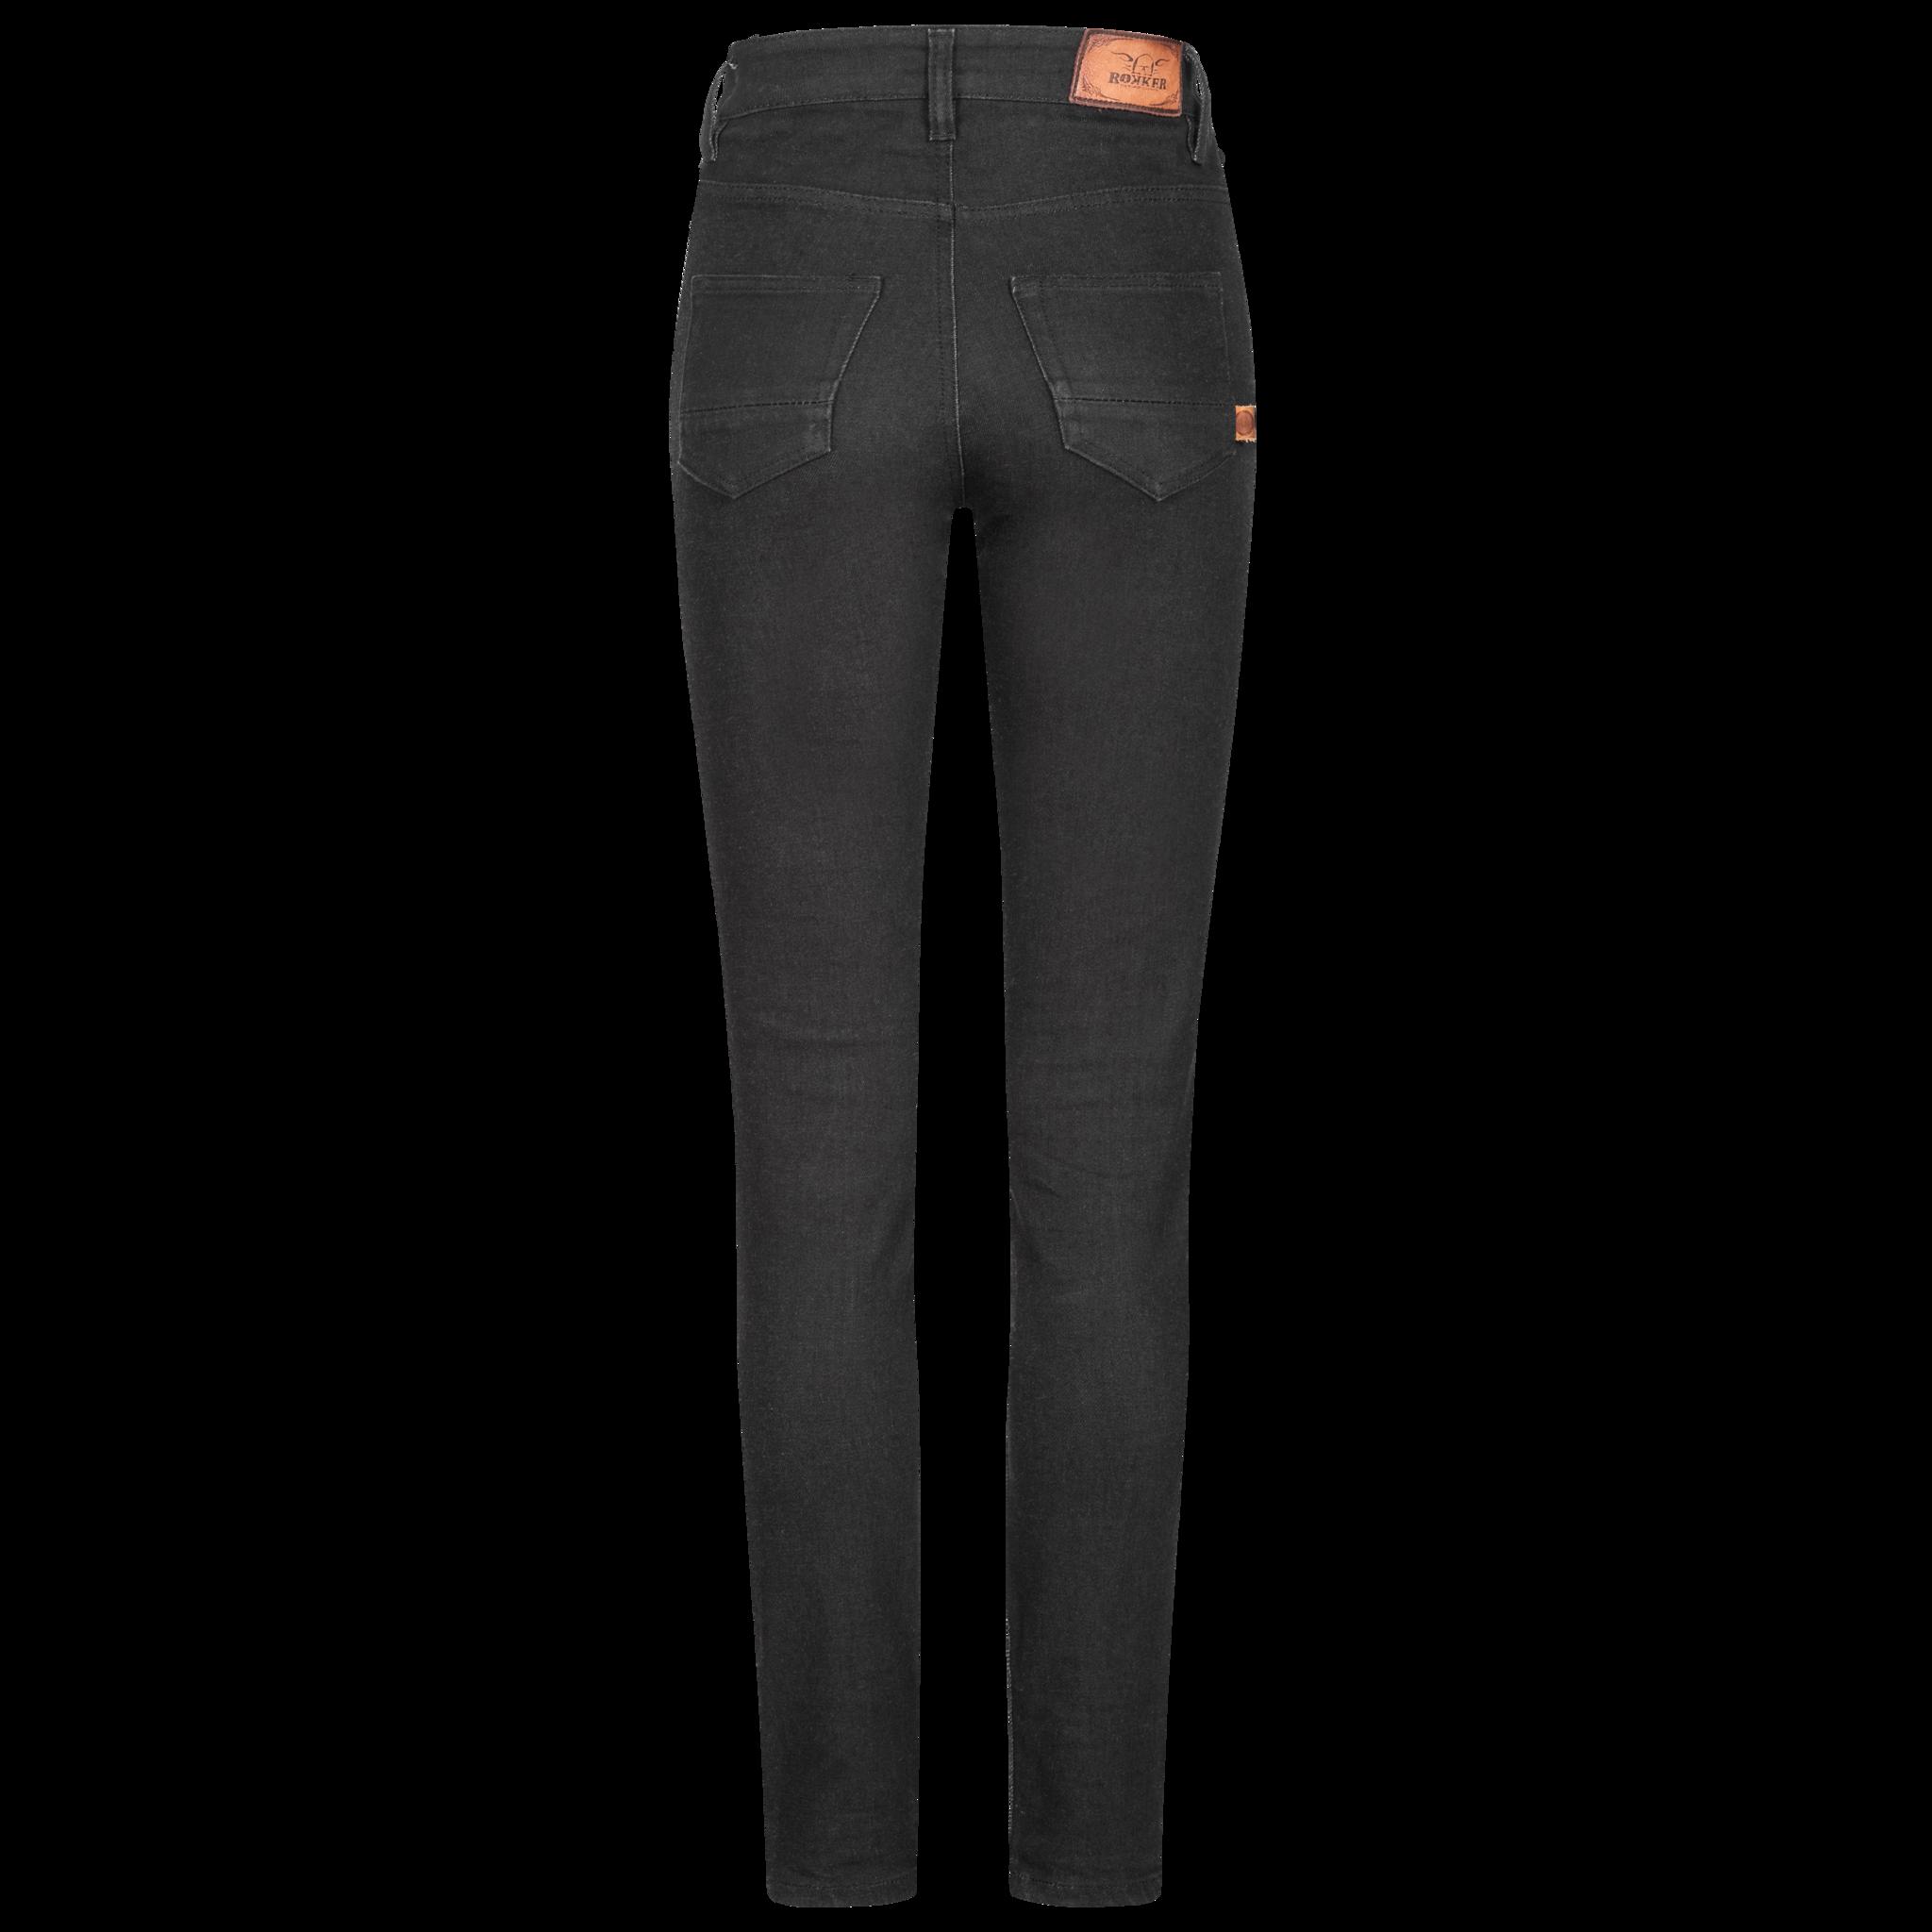 Rokkertech high waist black slim dames motorbroek L32-2